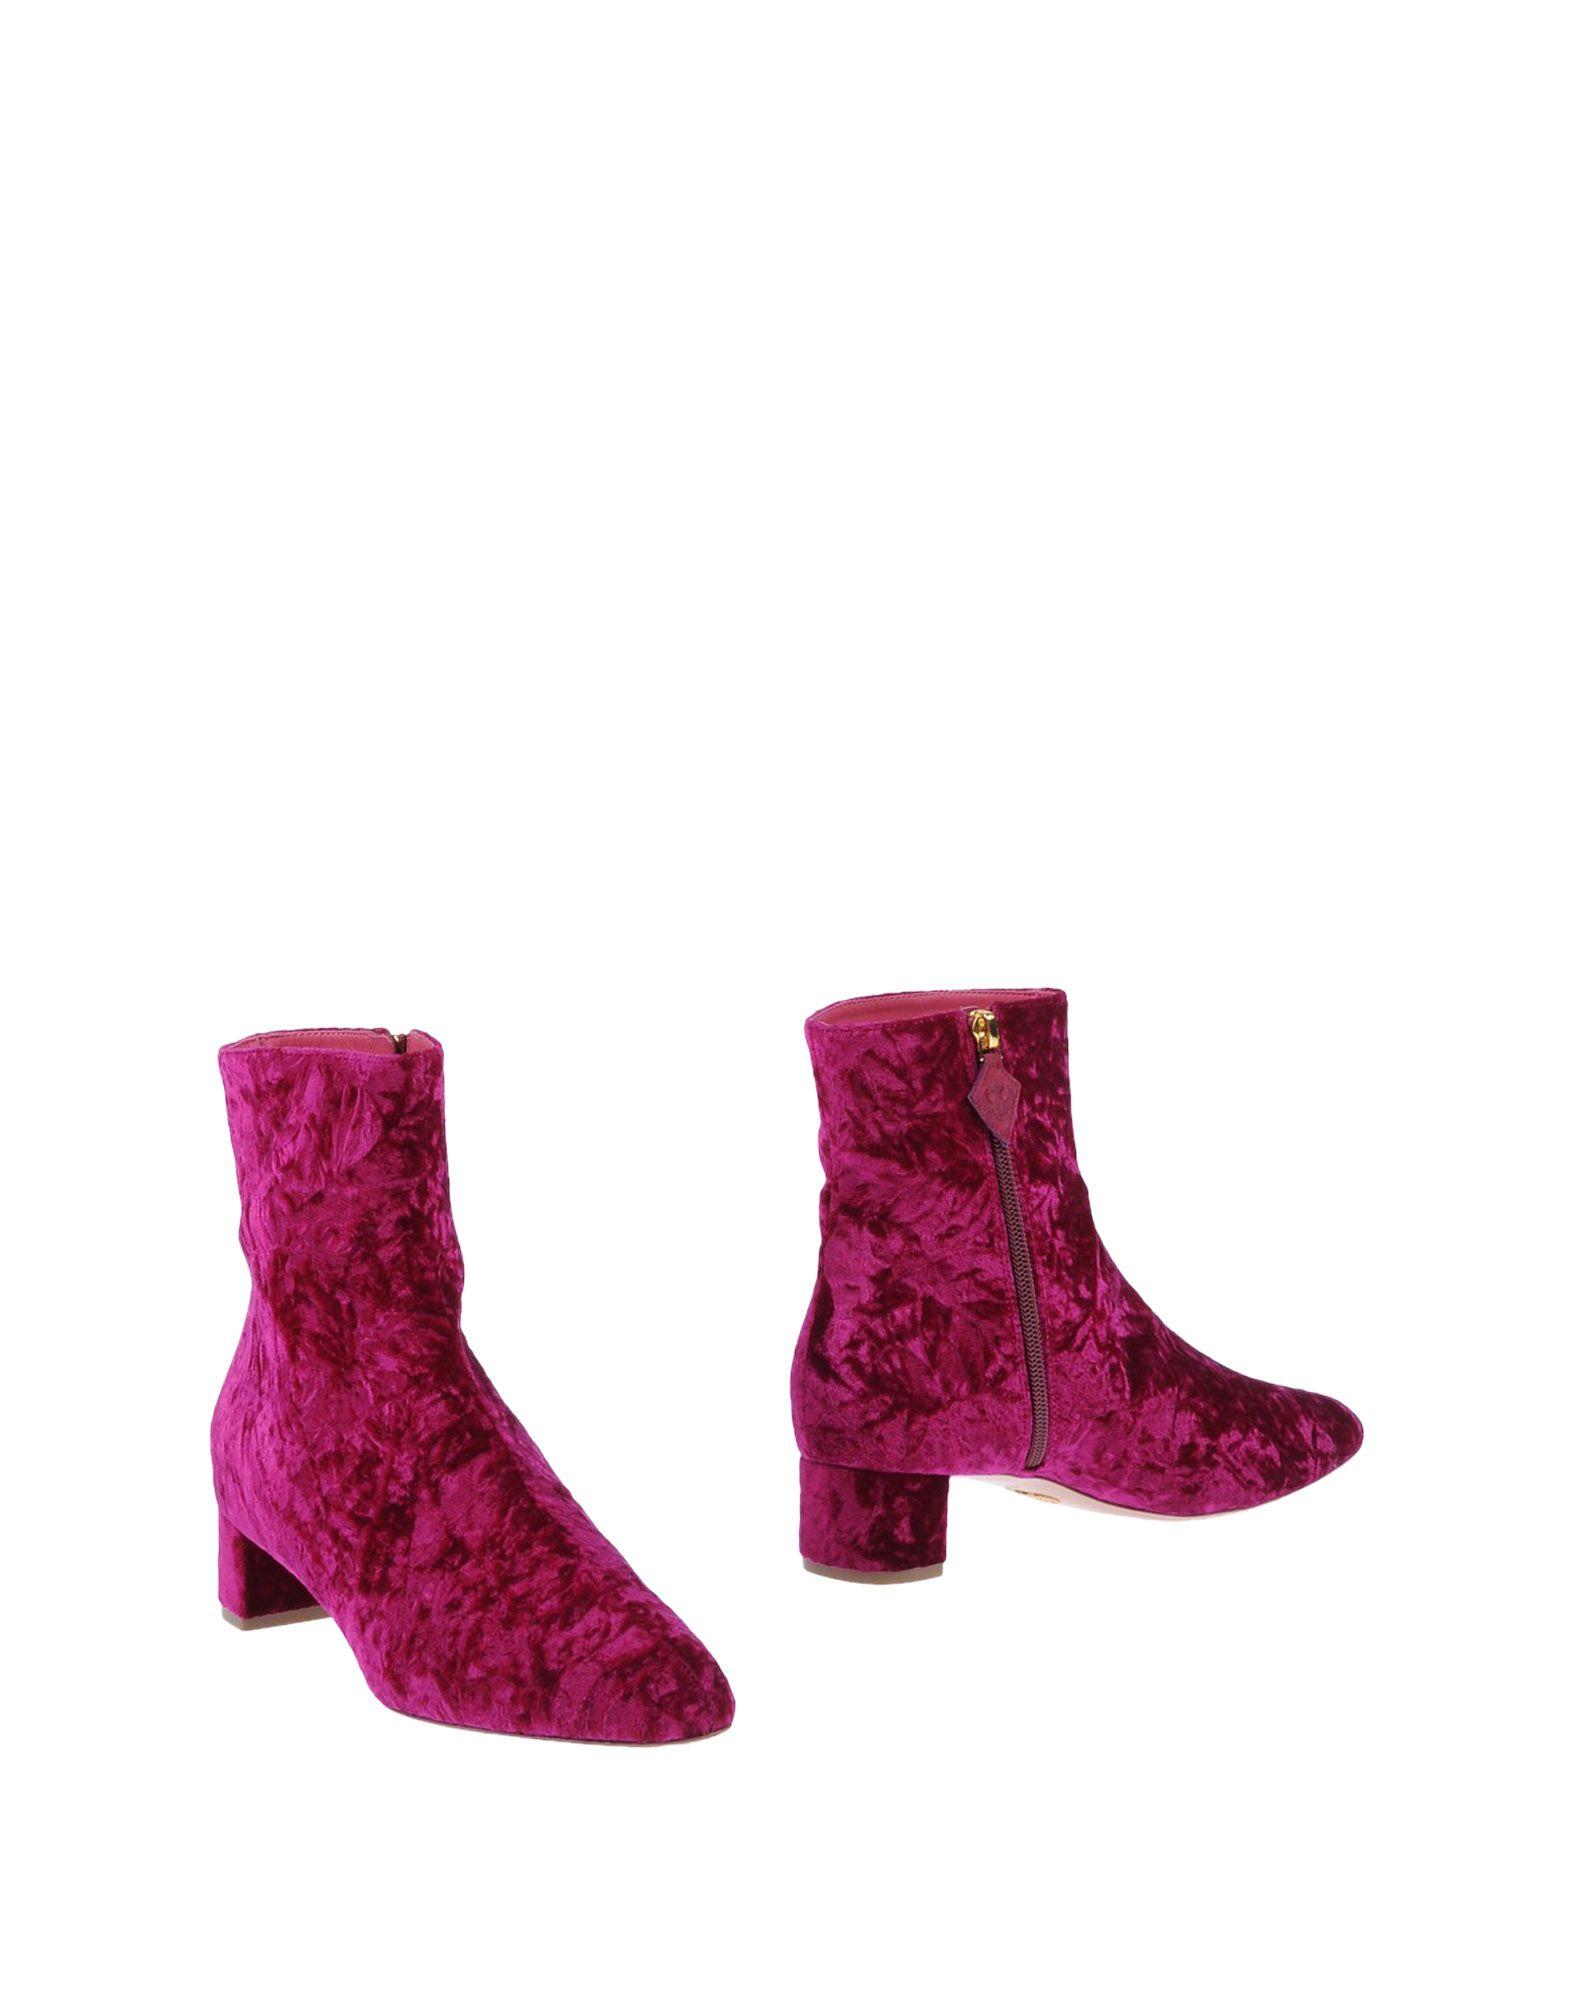 Oscar Tiye Stiefelette 11455684ET Damen  11455684ET Stiefelette Neue Schuhe 8147af